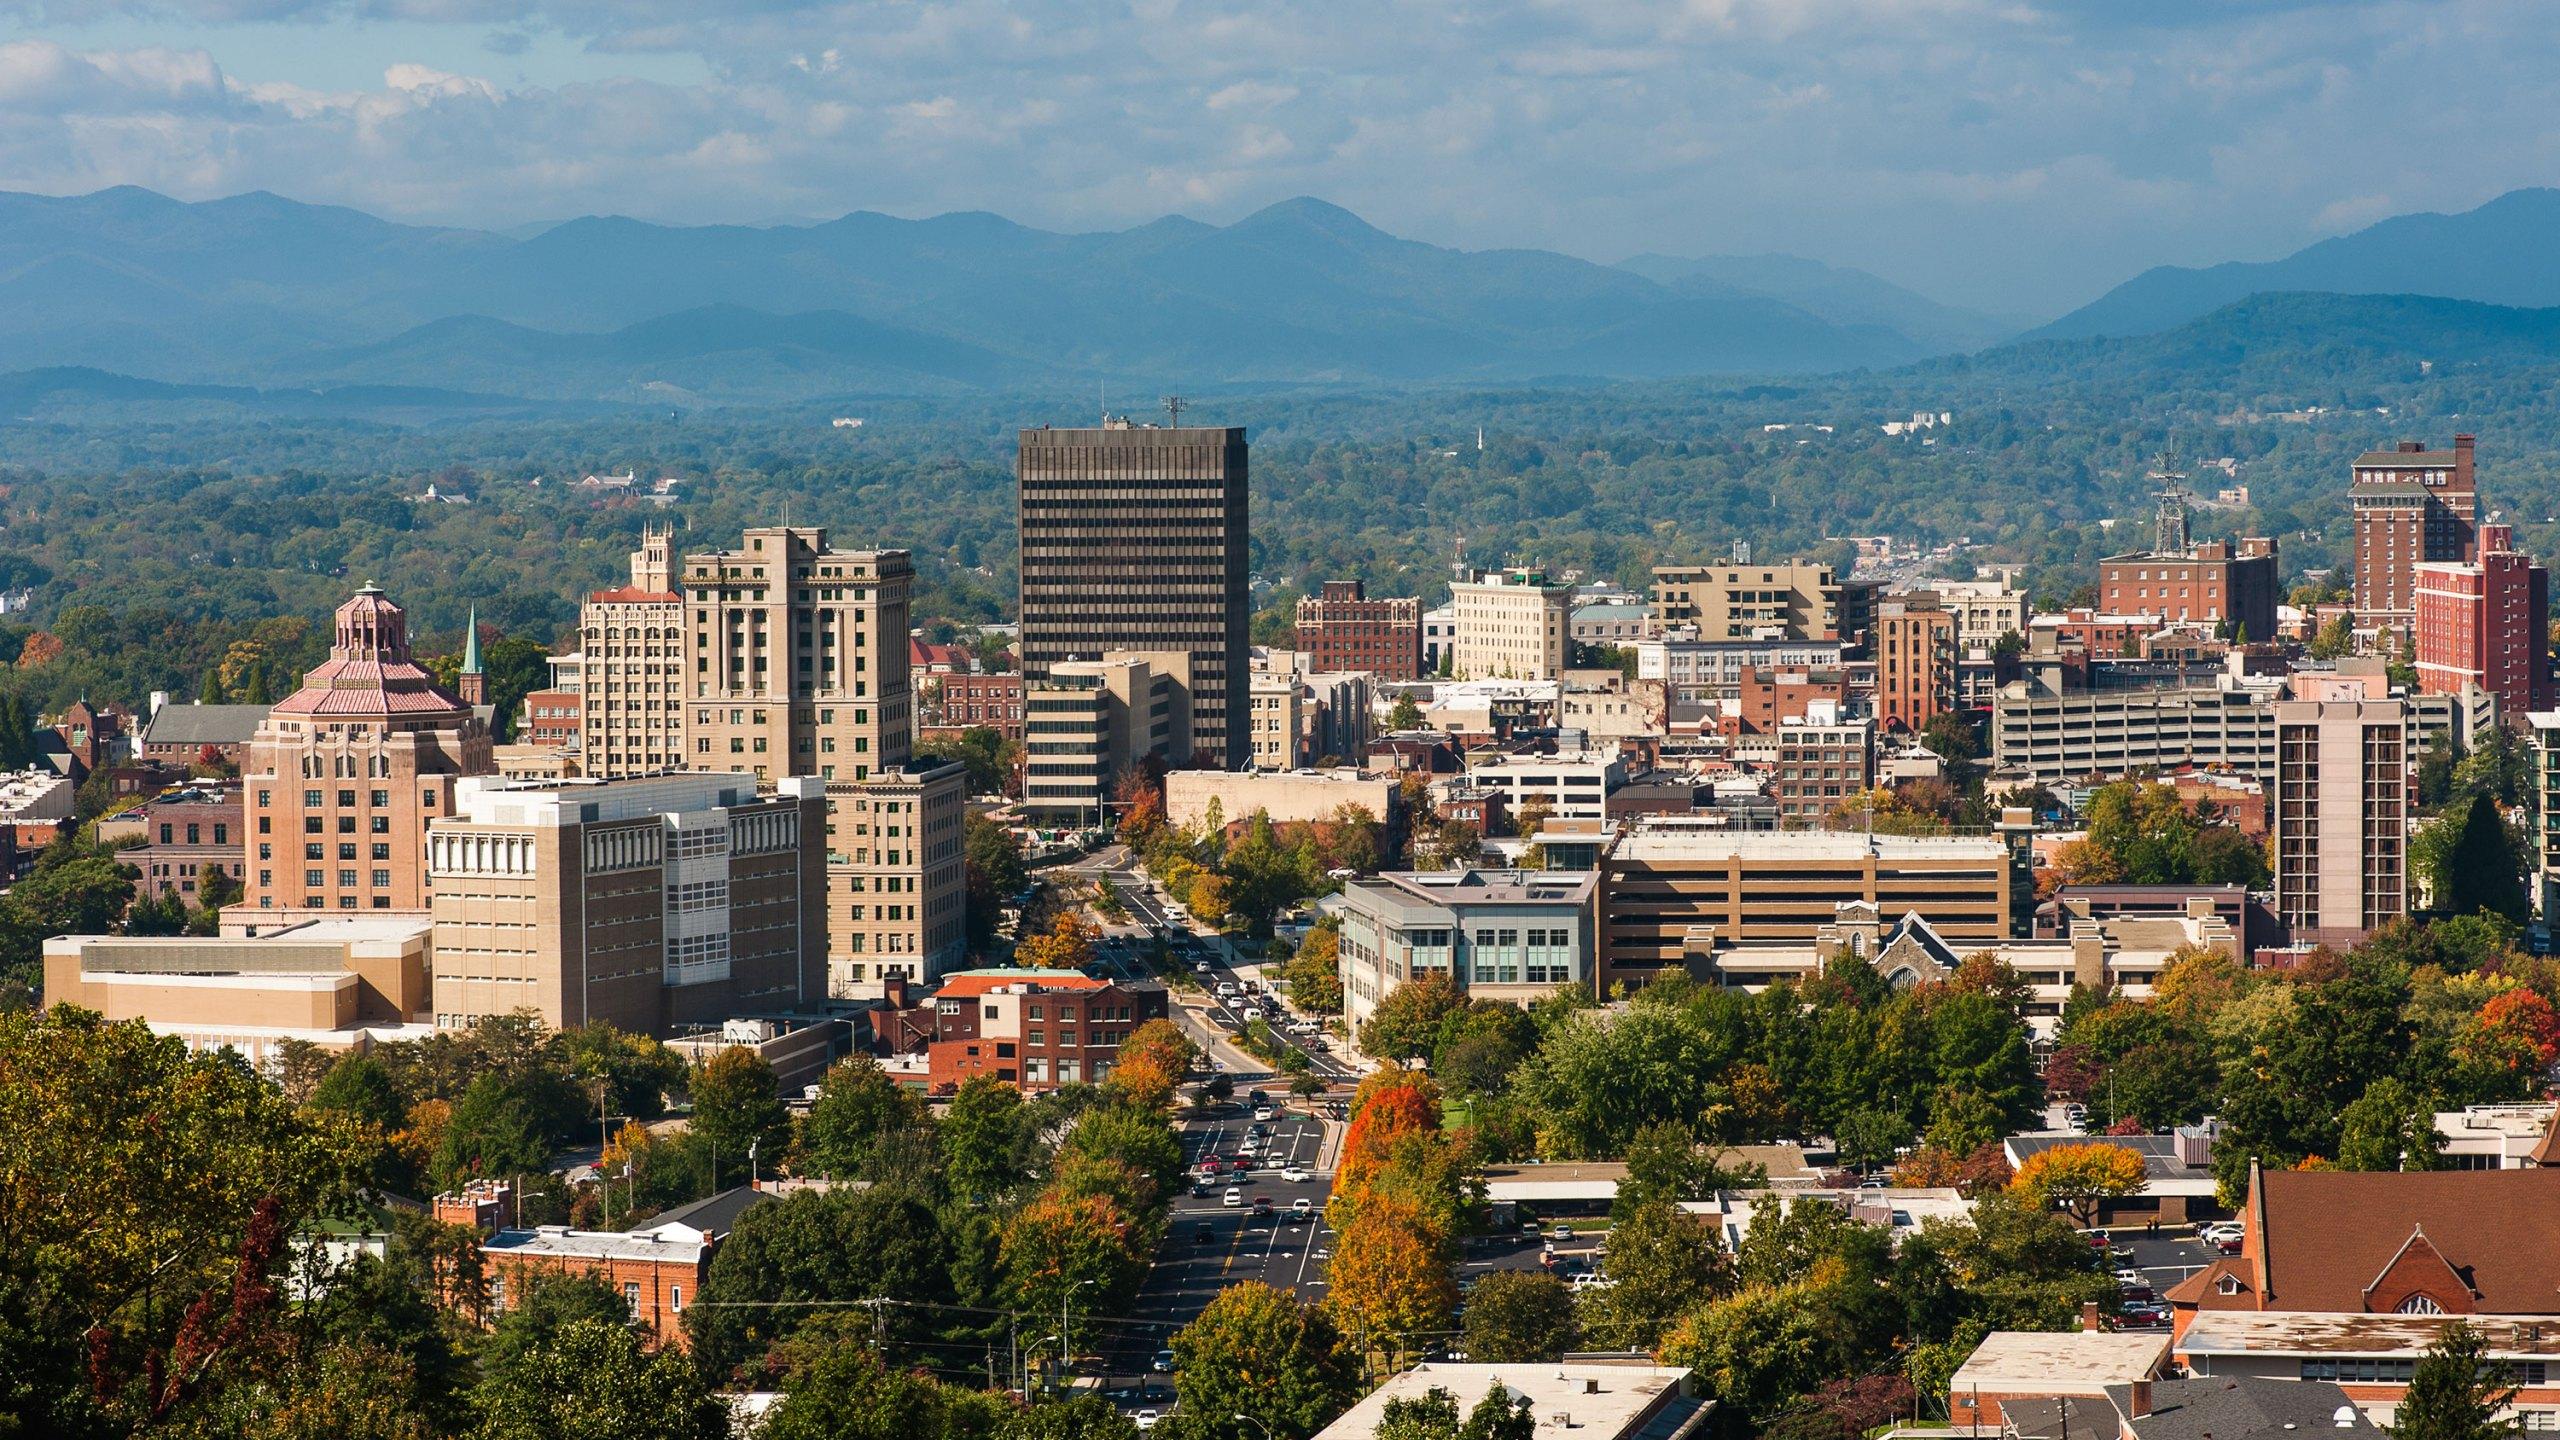 Asheville, North Carolina (Shutterstock)